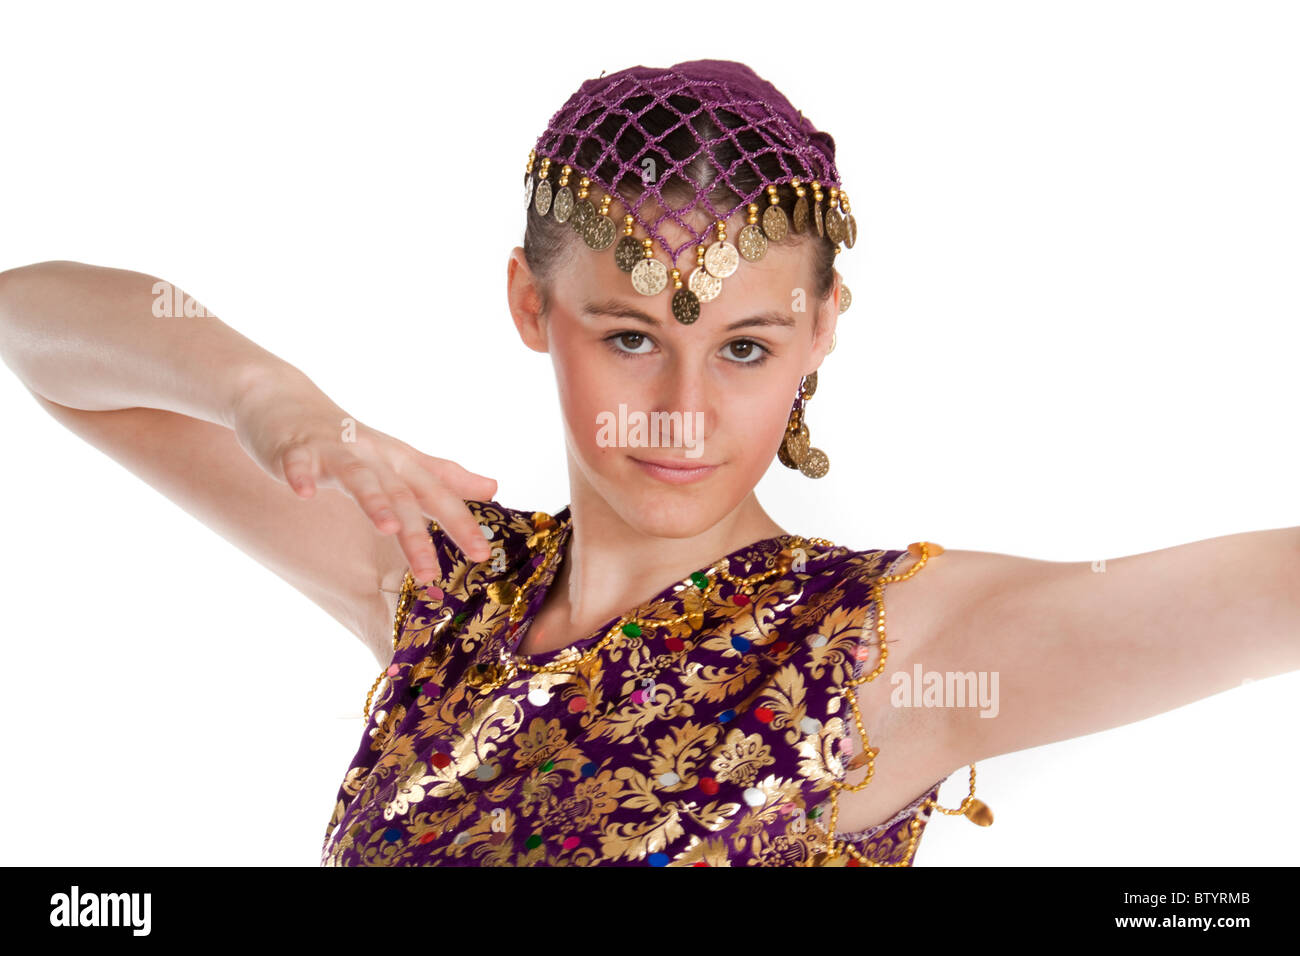 cf6b1da14b1ae Studio shot of beautiful young girl in Turkish dancing costume - Stock Image